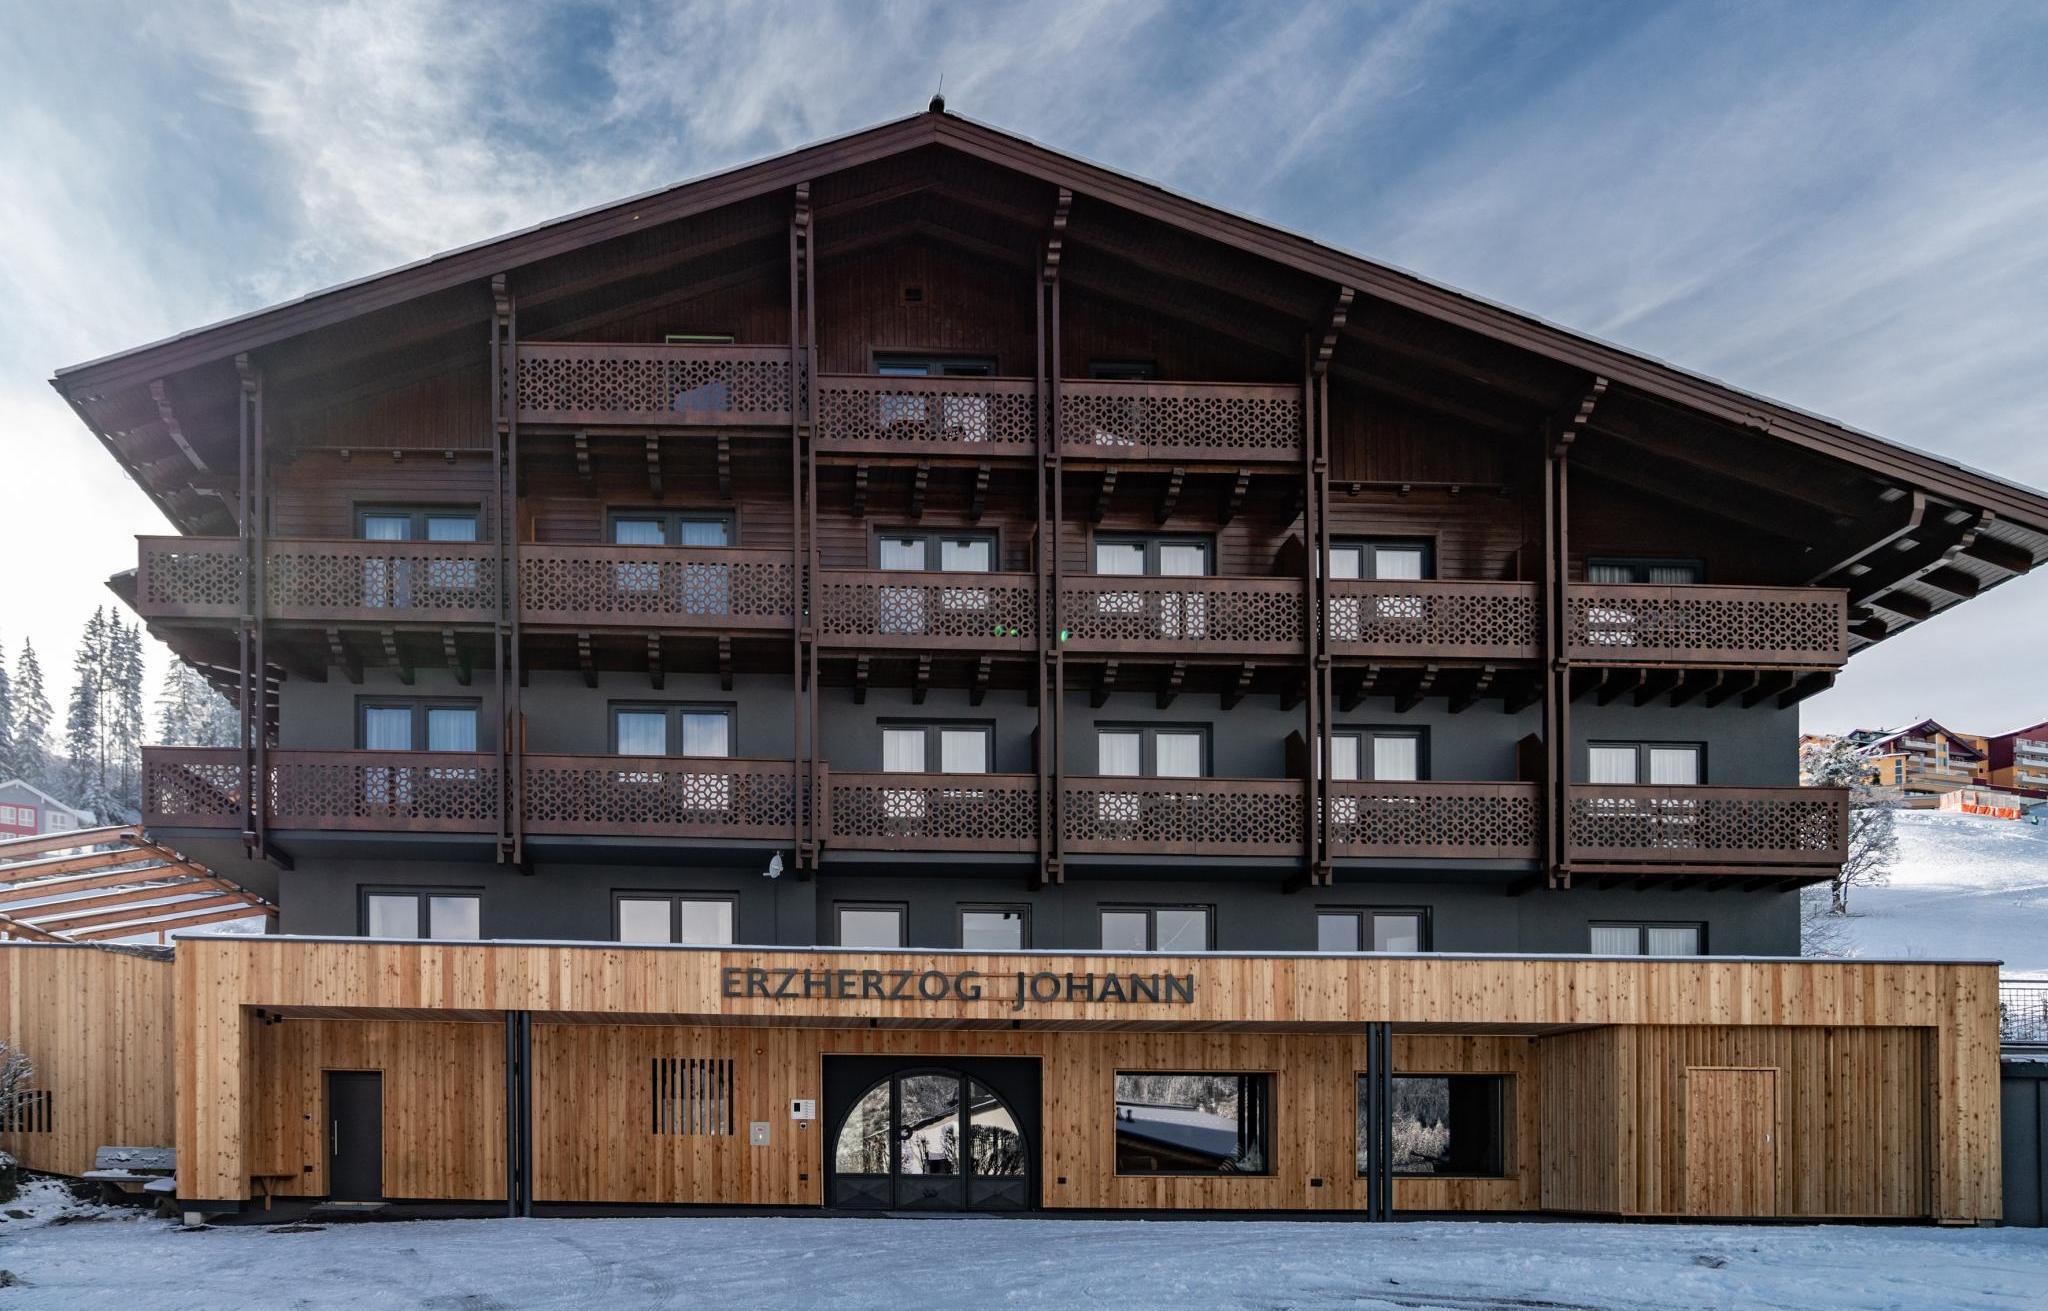 Alpenhotel Erzherzog Johann Salzburgerland